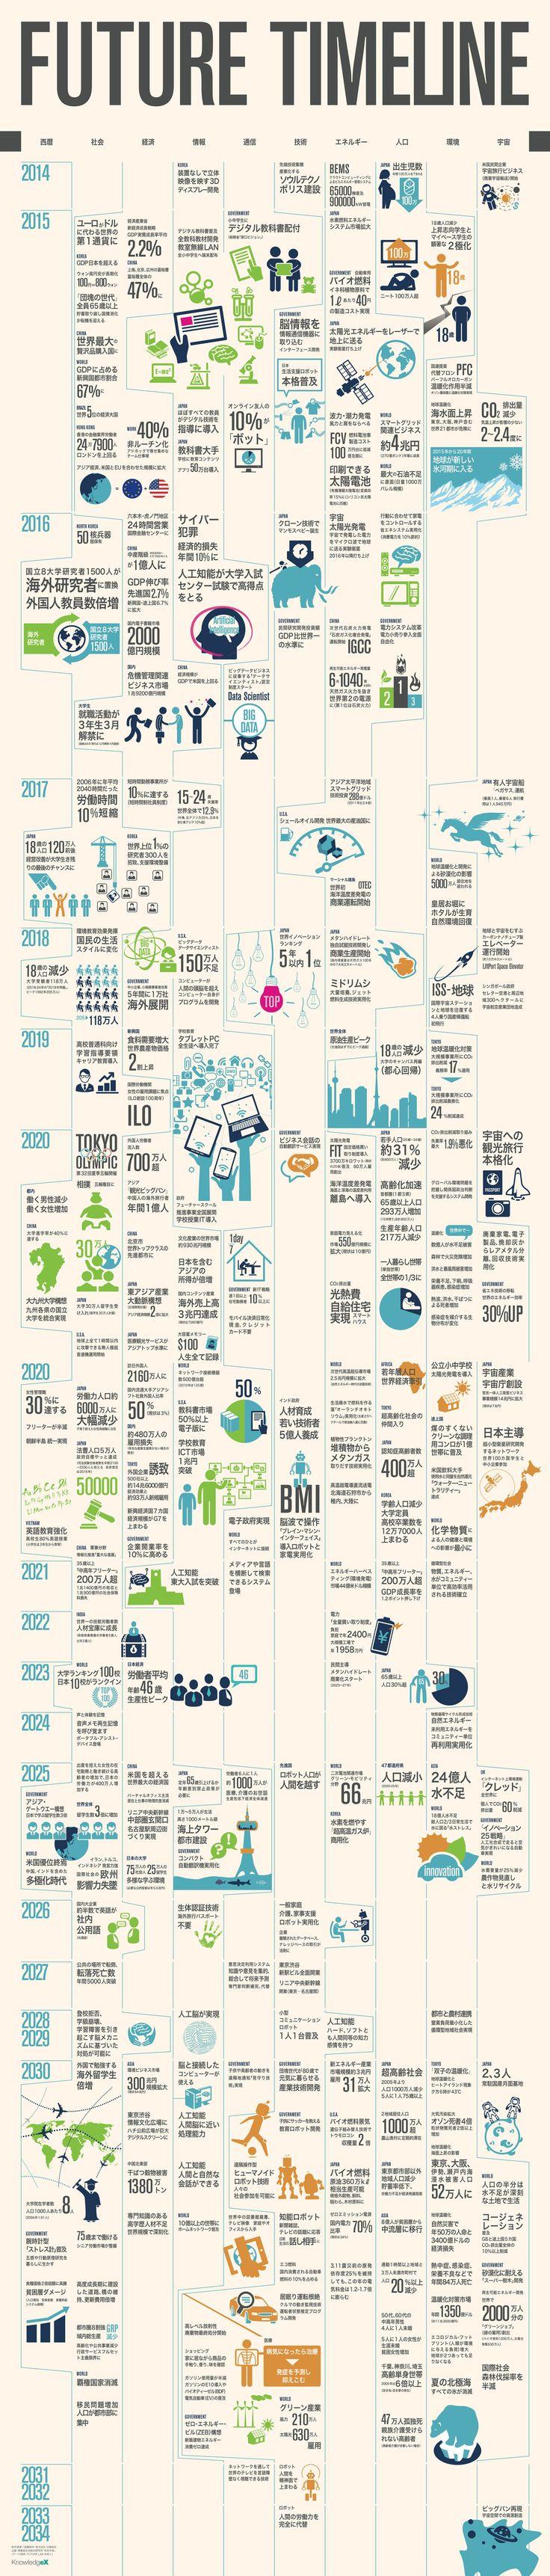 infogra.me(インフォグラミー)| Future Timeline infographic timeline design